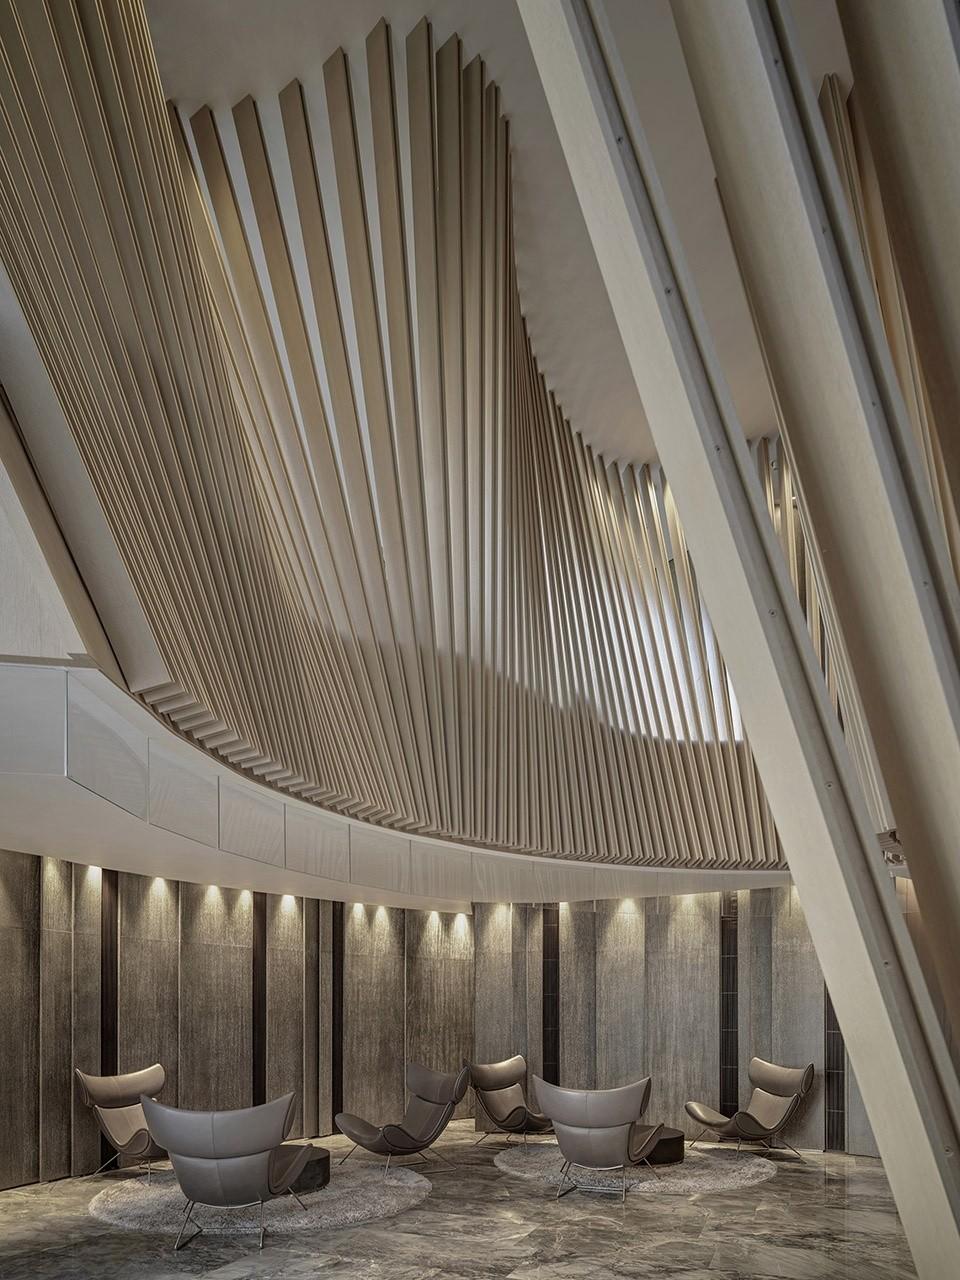 002-tseung-kwan-o-alto-residences-clubhouse-china-by-one-plus-partnership-960x1280.jpg